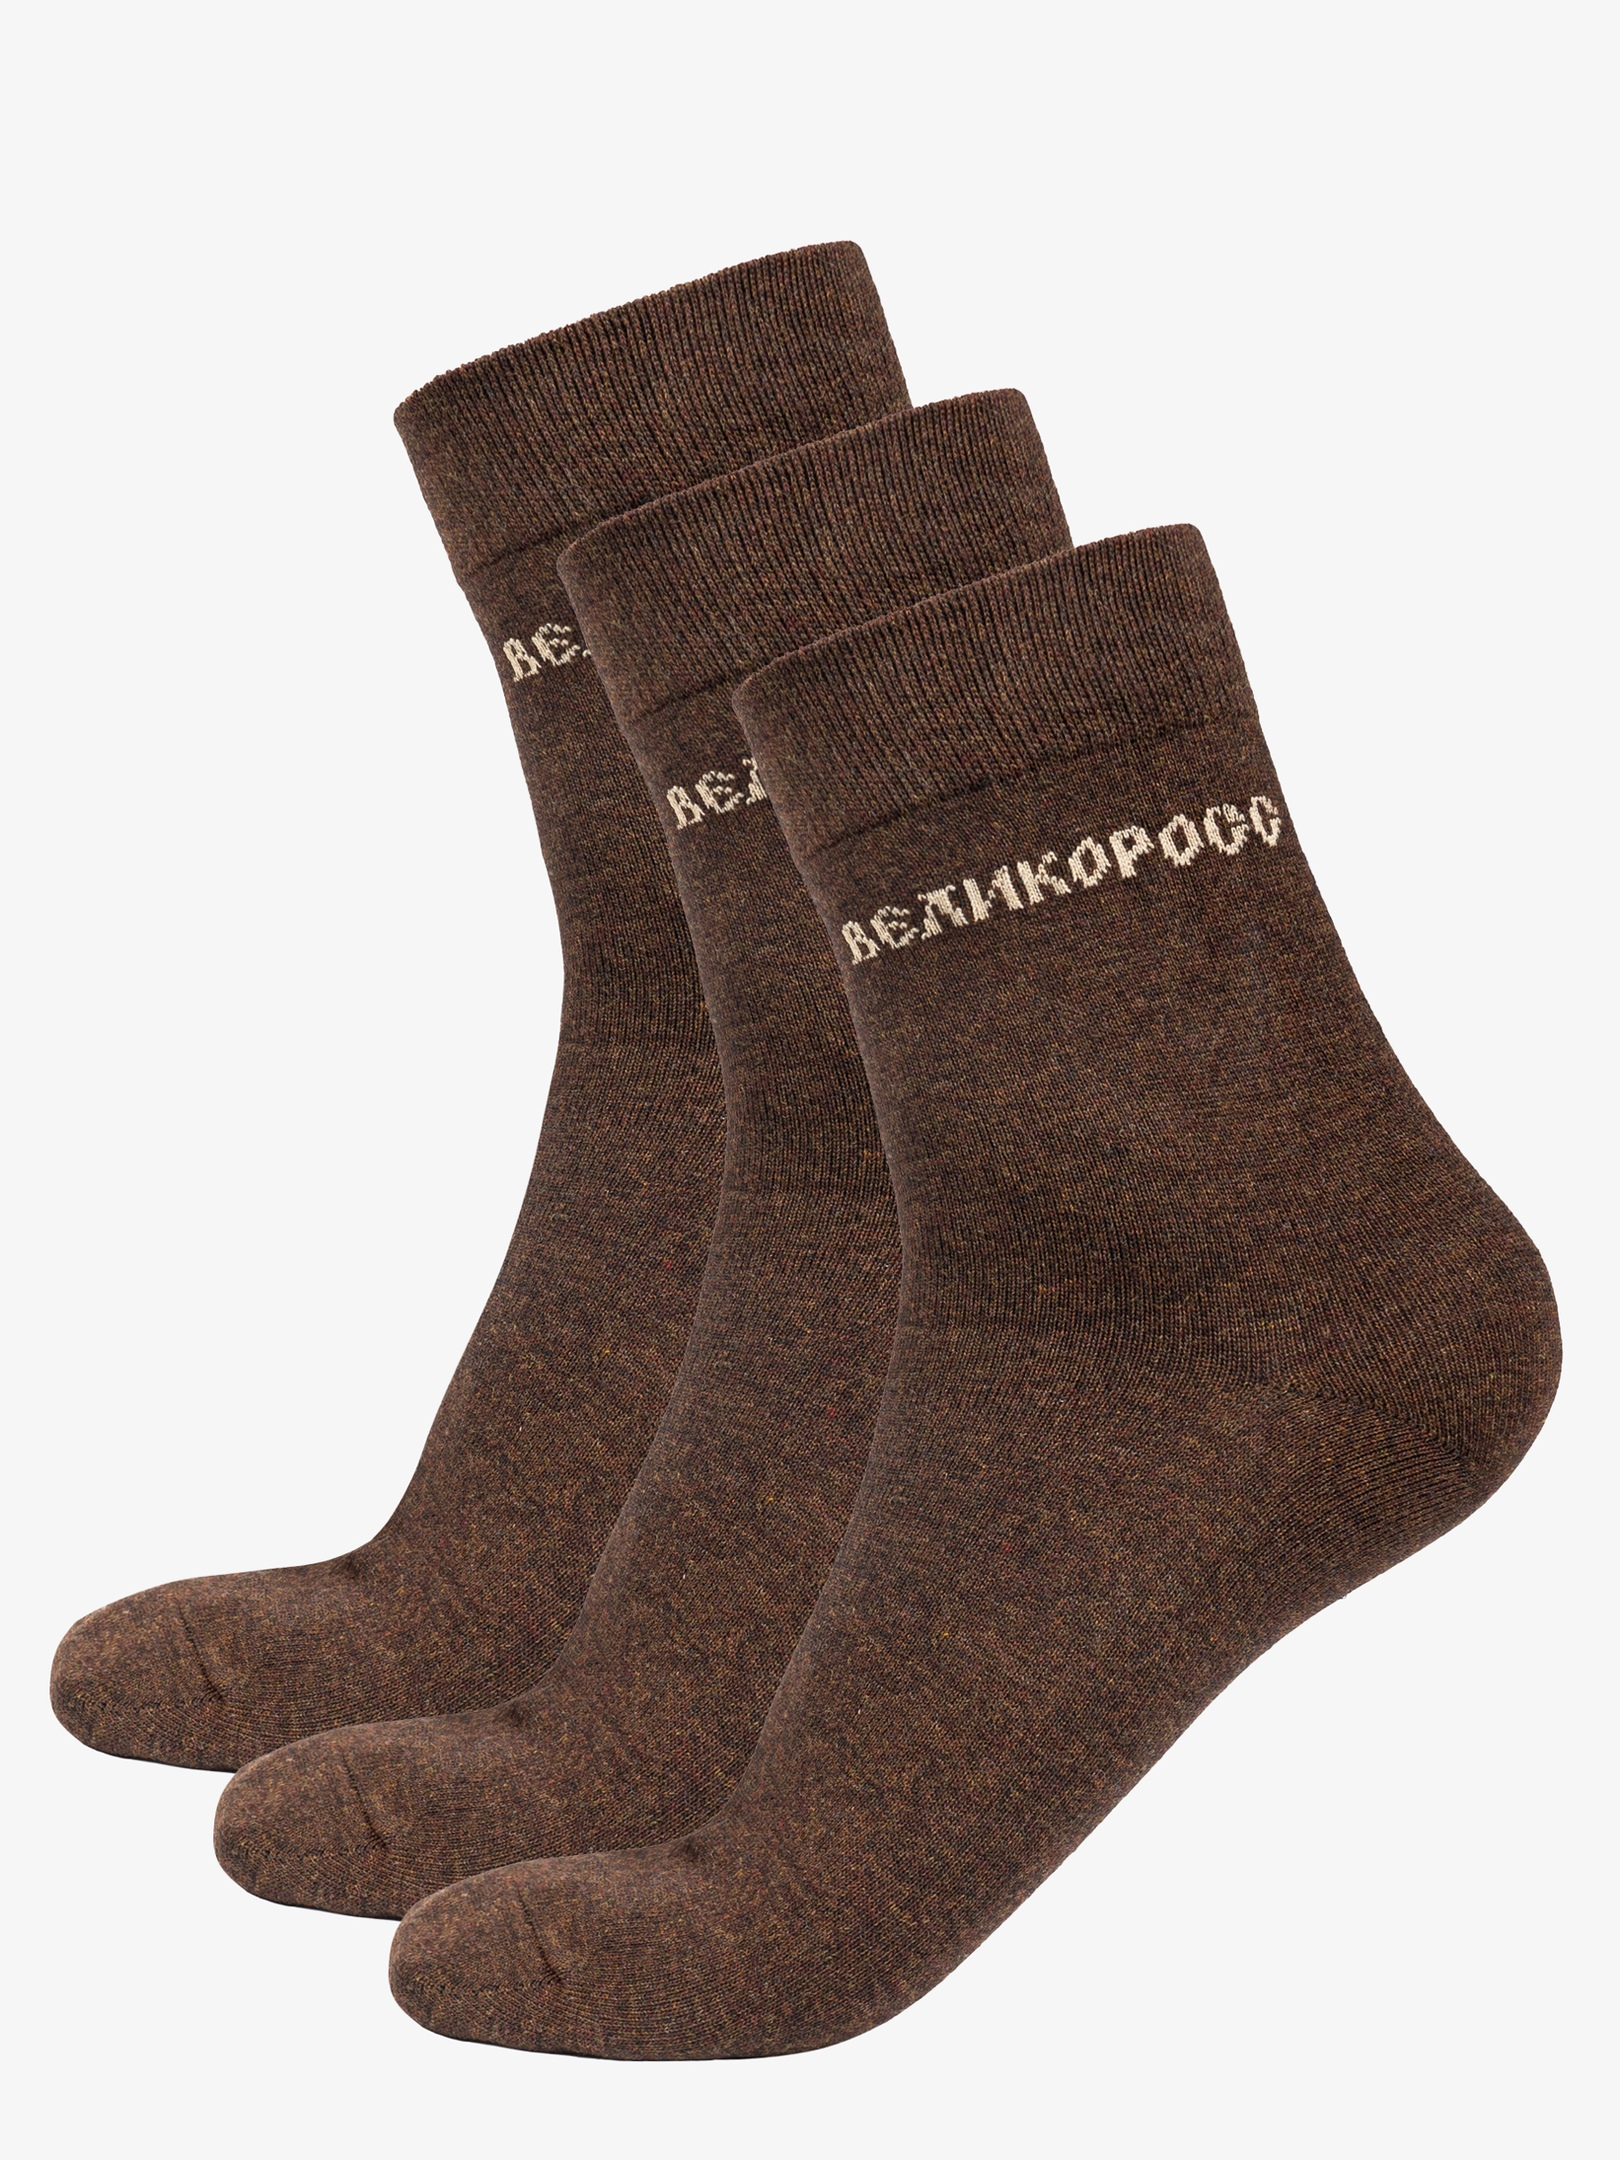 Носки унисекс Великоросс NN35611 коричневый 29